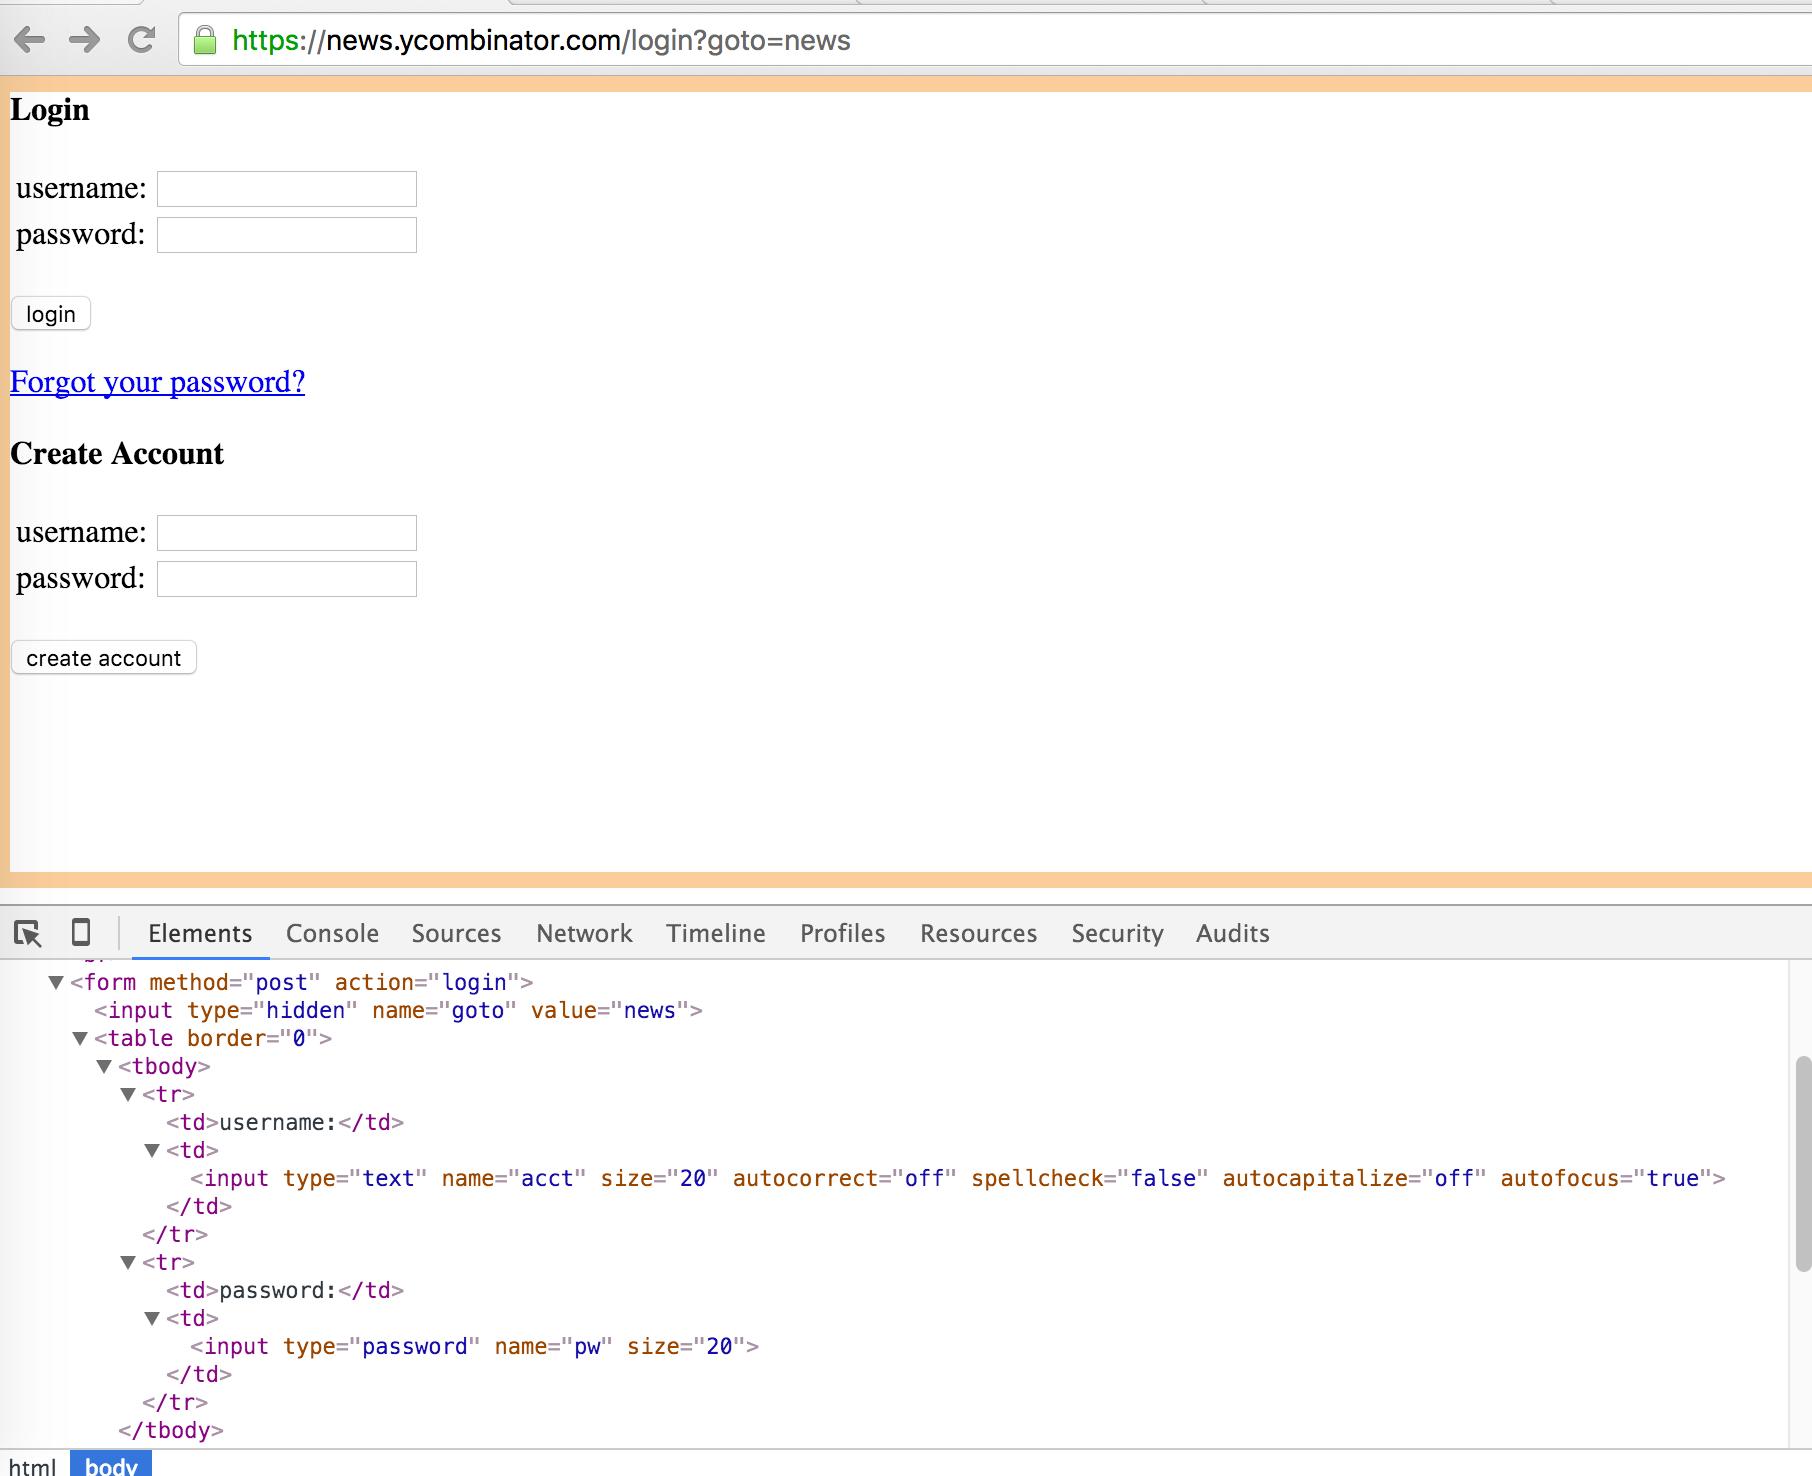 Hacker News login form